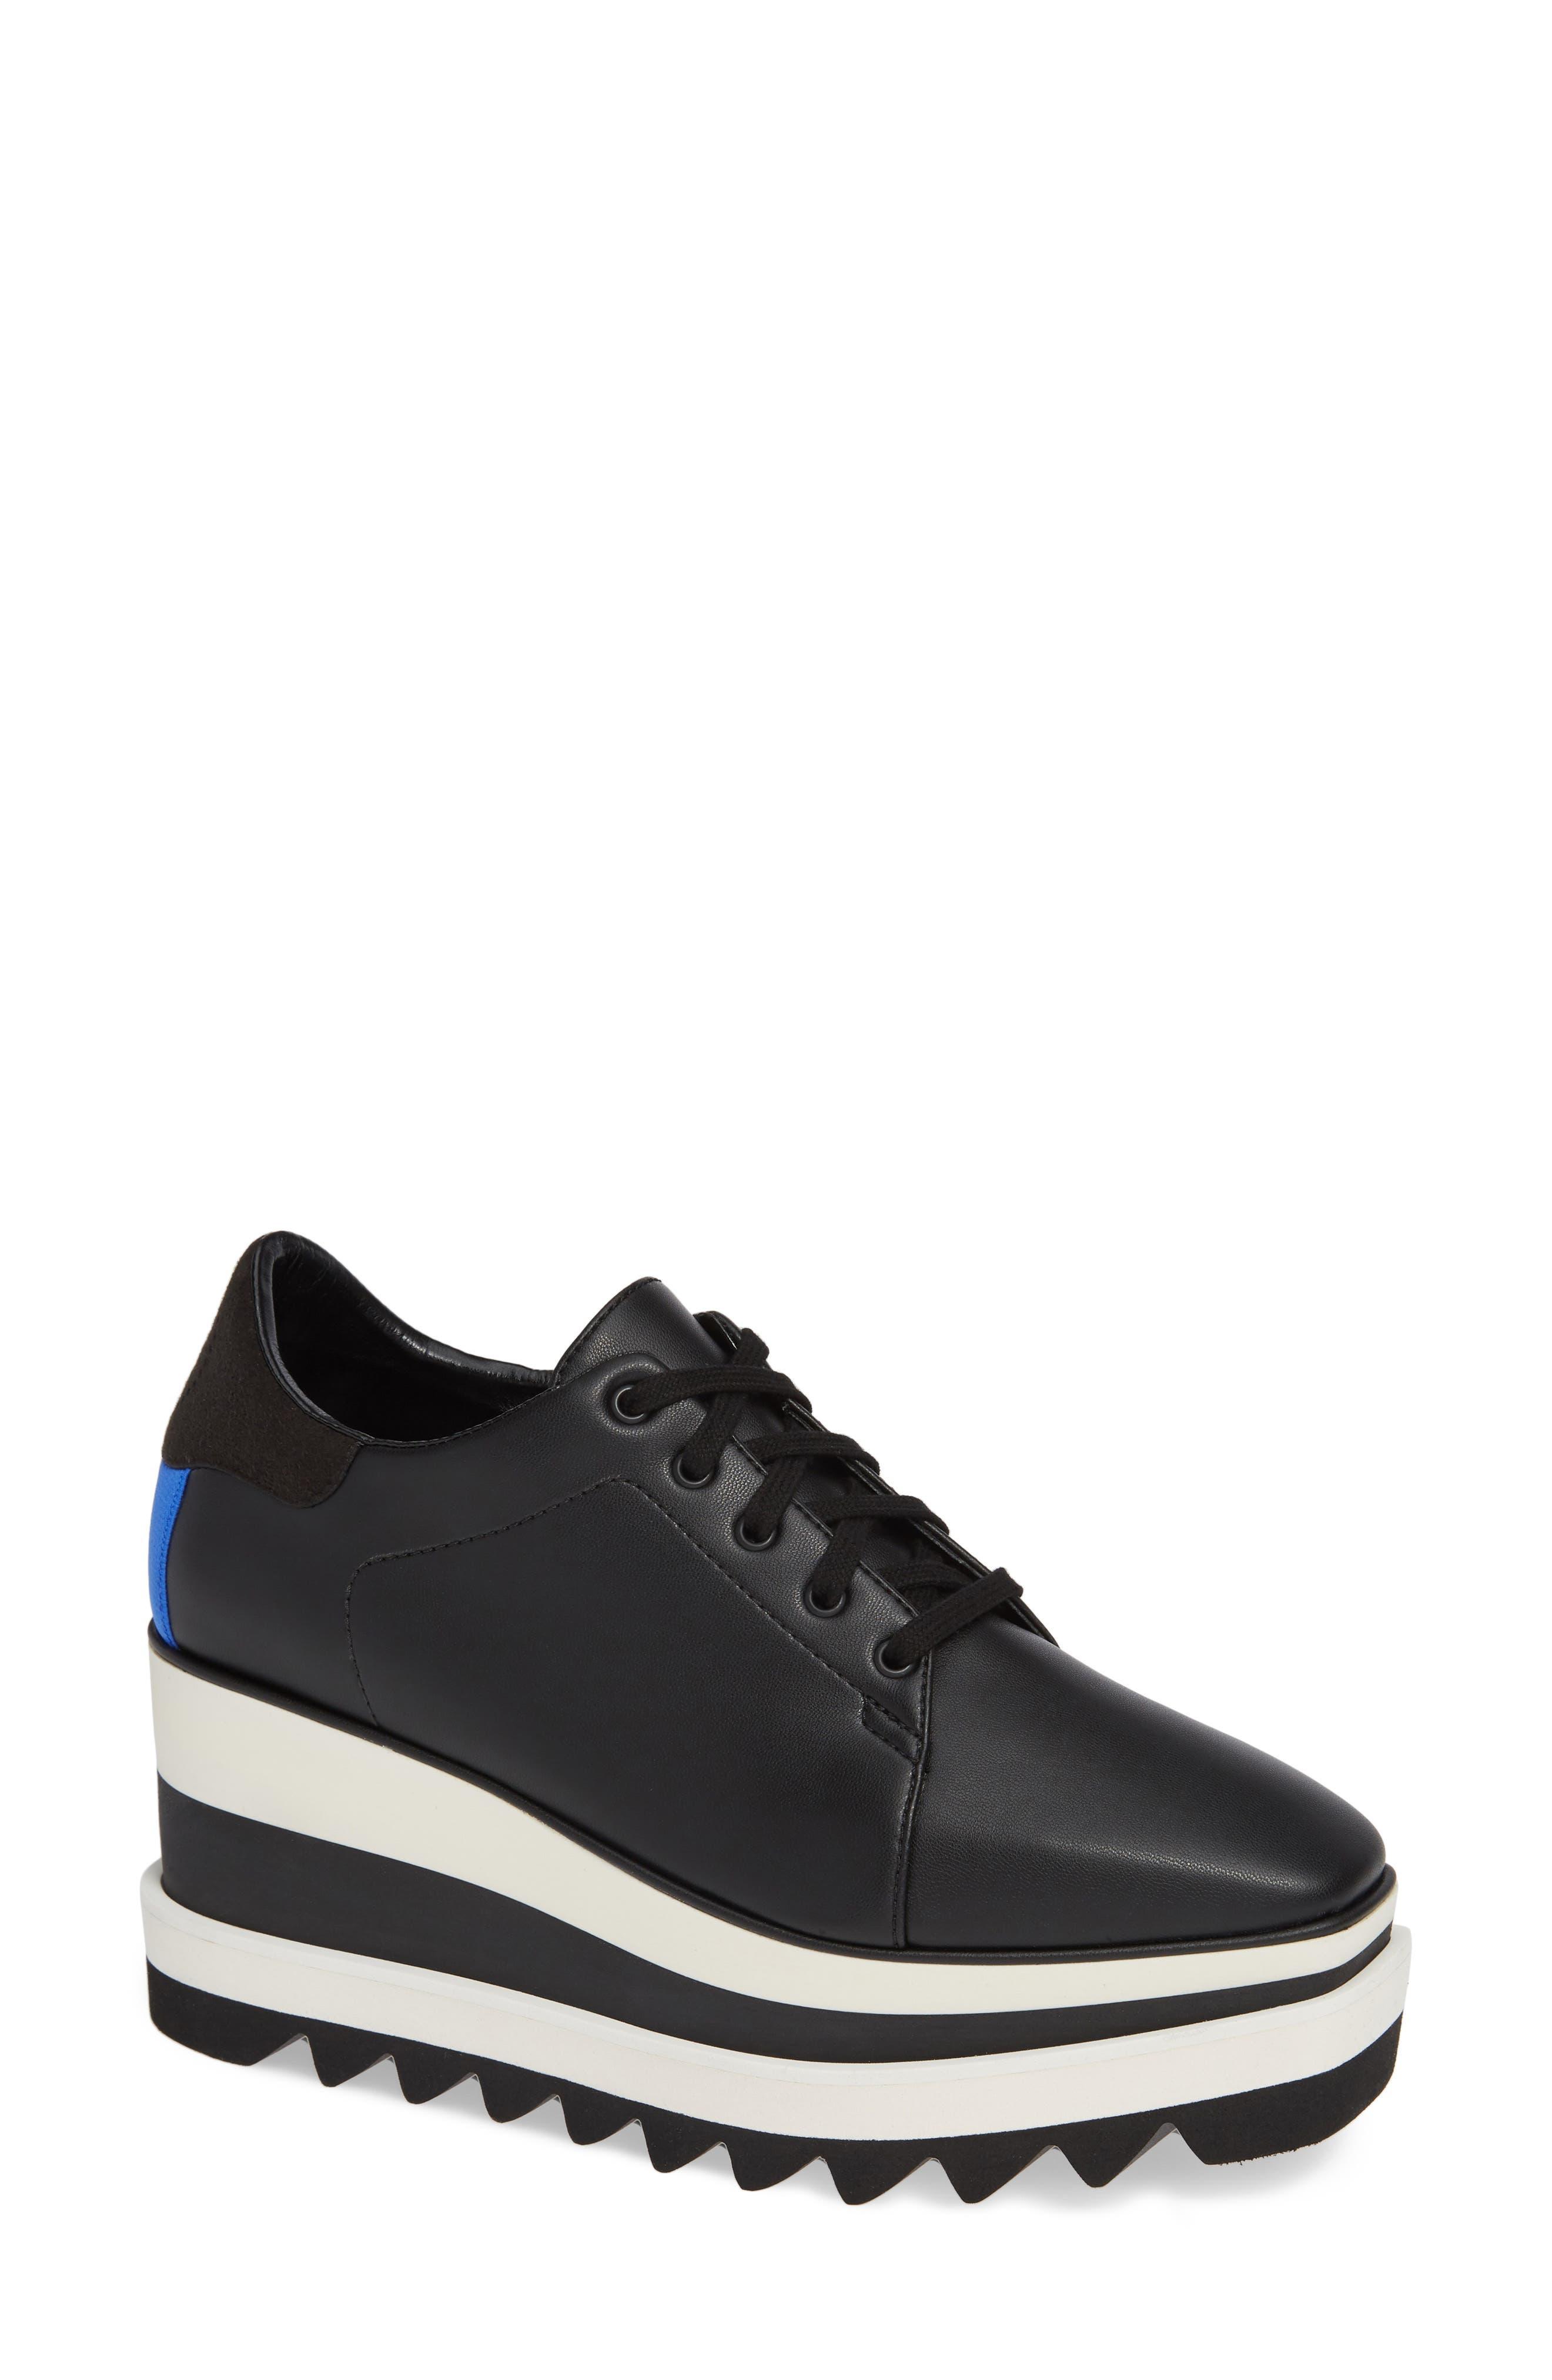 Sneak-Elyse Flatform Sneaker,                             Main thumbnail 1, color,                             BLACK